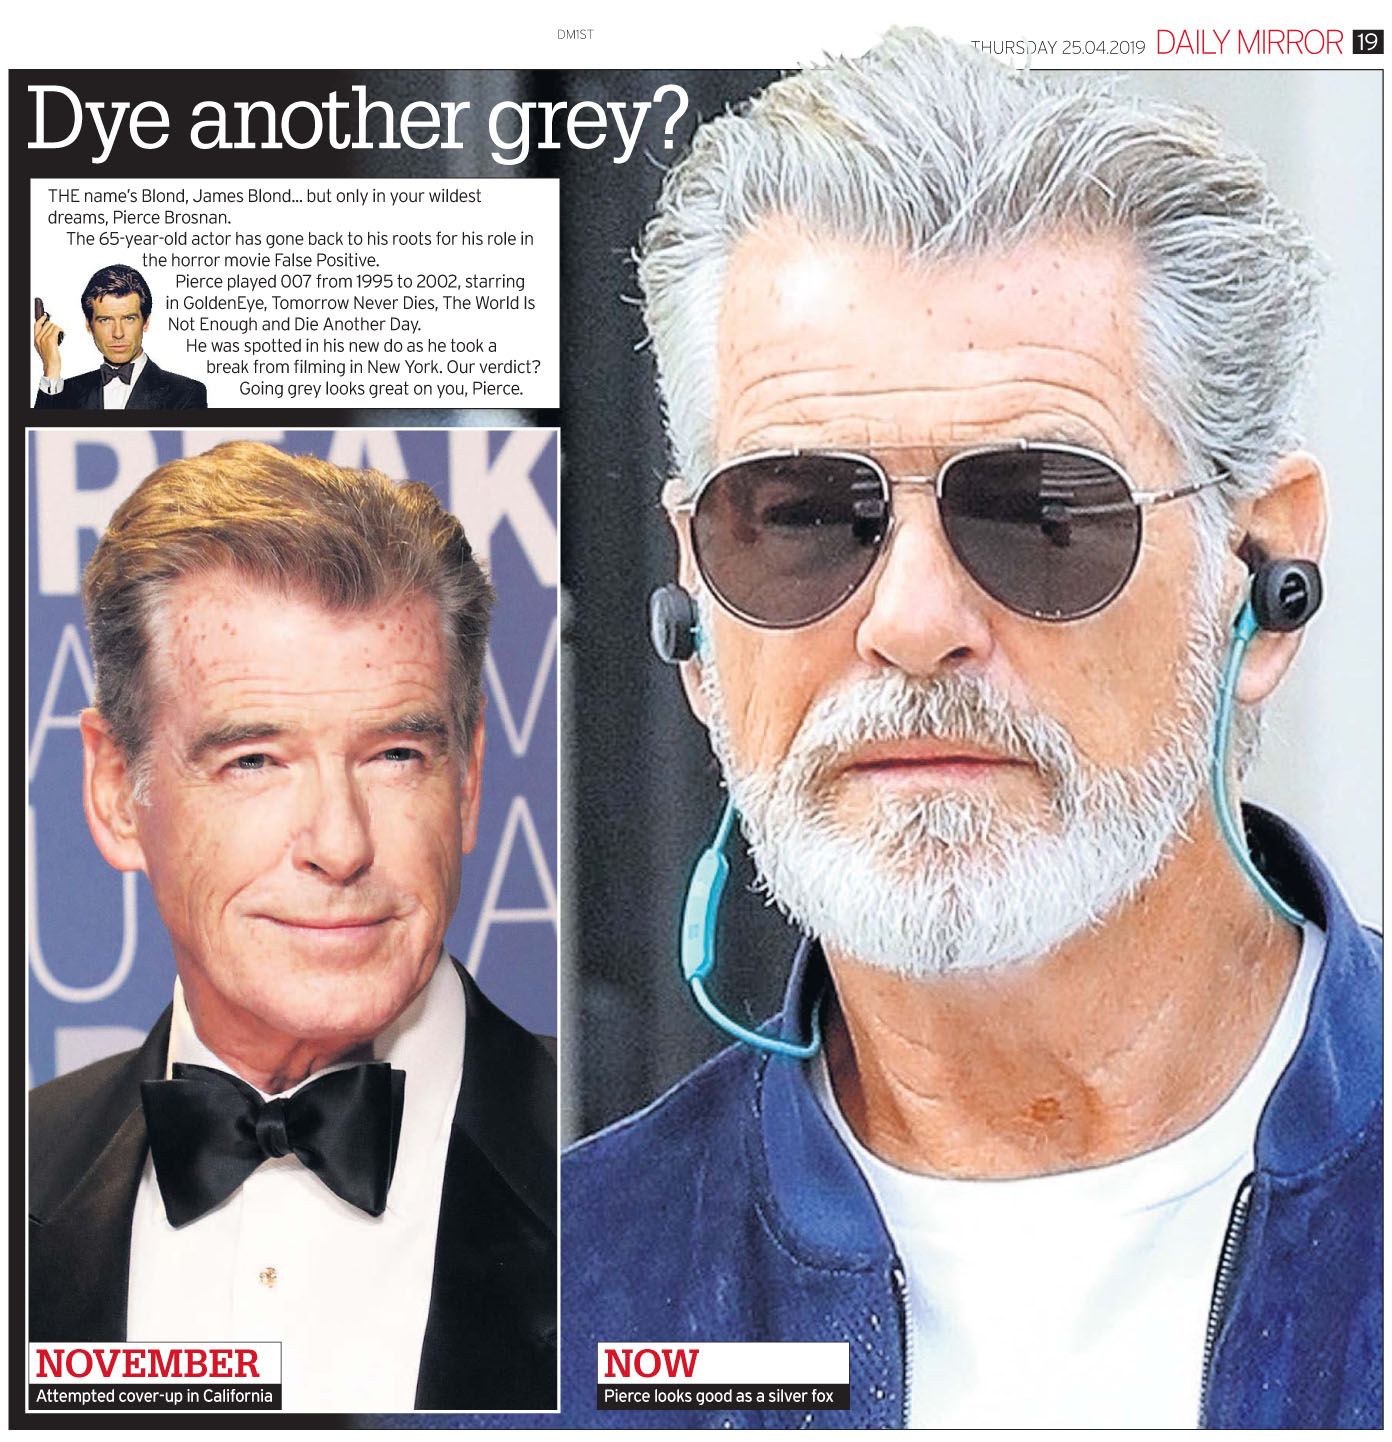 Daily Mirror April 25 2019 PBrosnan.jpg